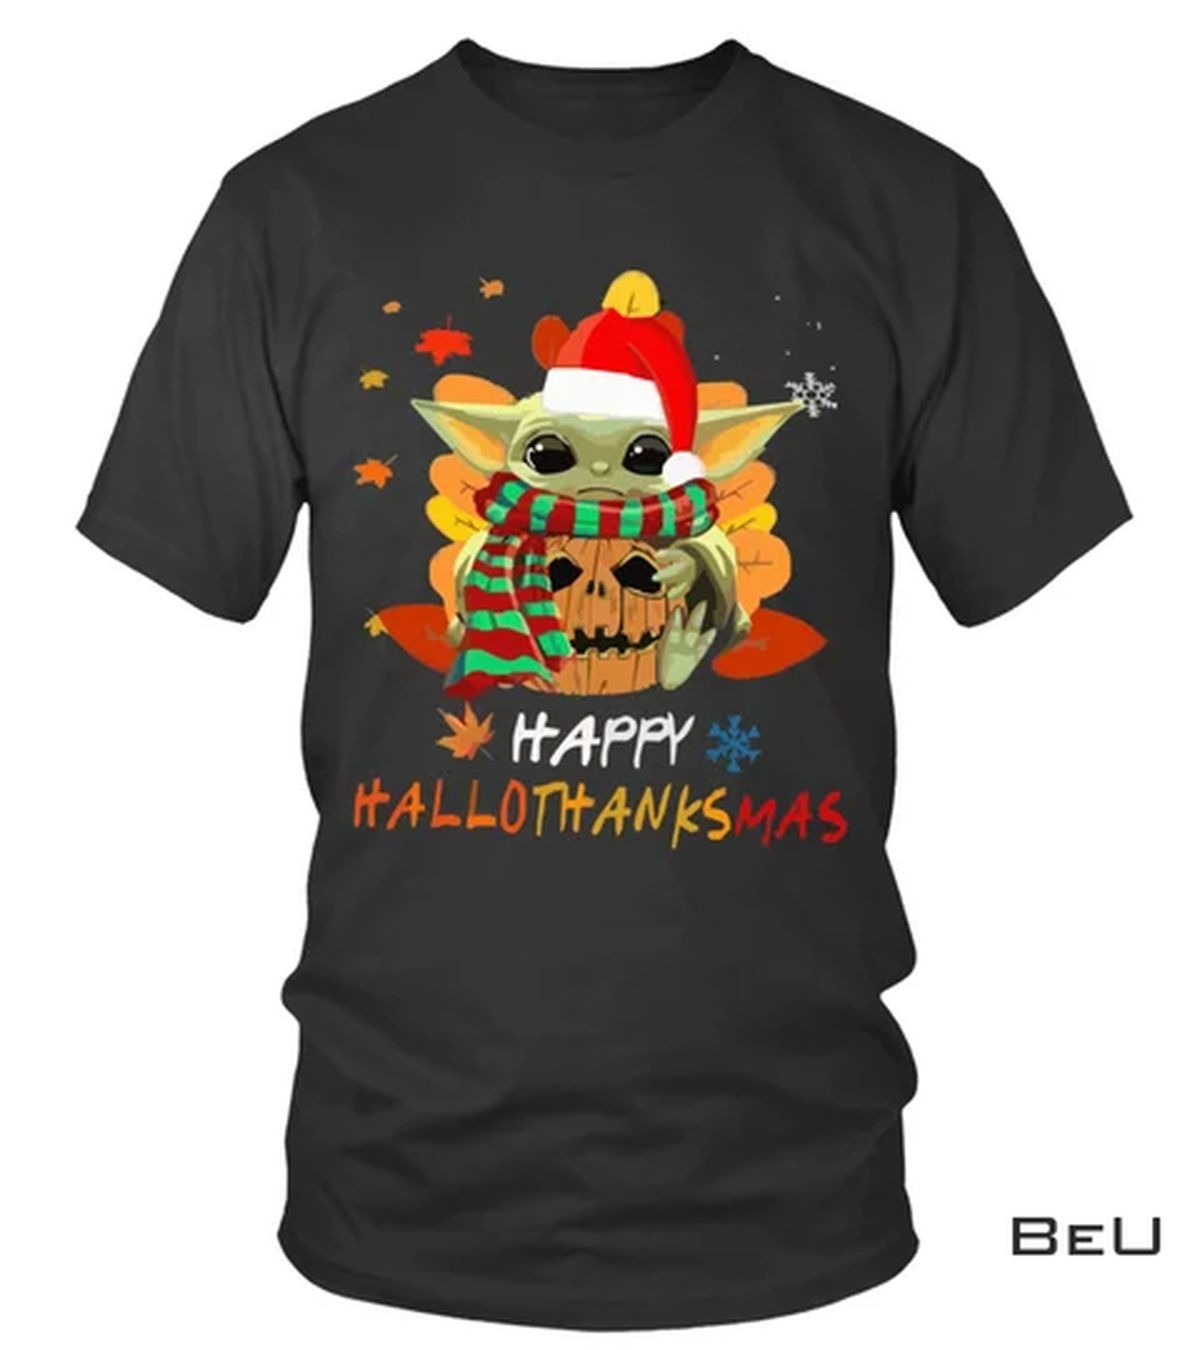 Baby Yoda Pumpkin Hallothanksmas Shirt